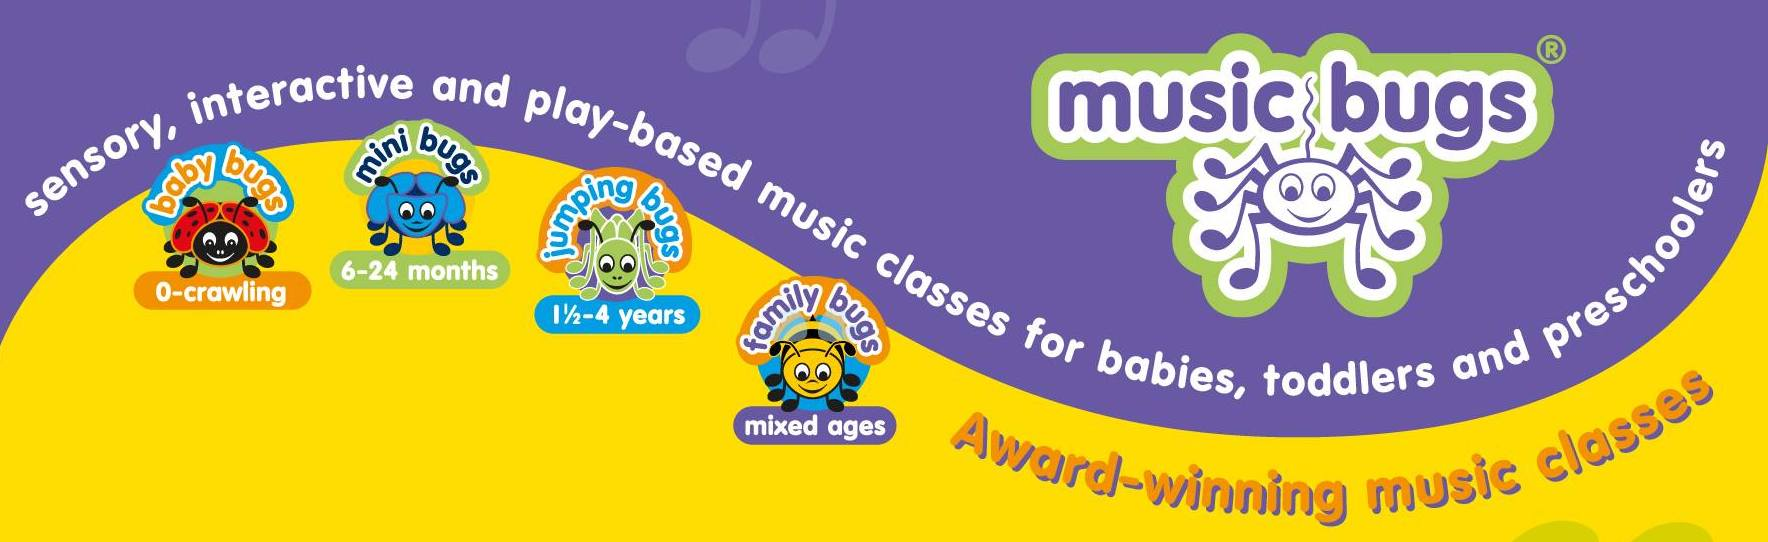 Music Bugs Milton Keynes's main image